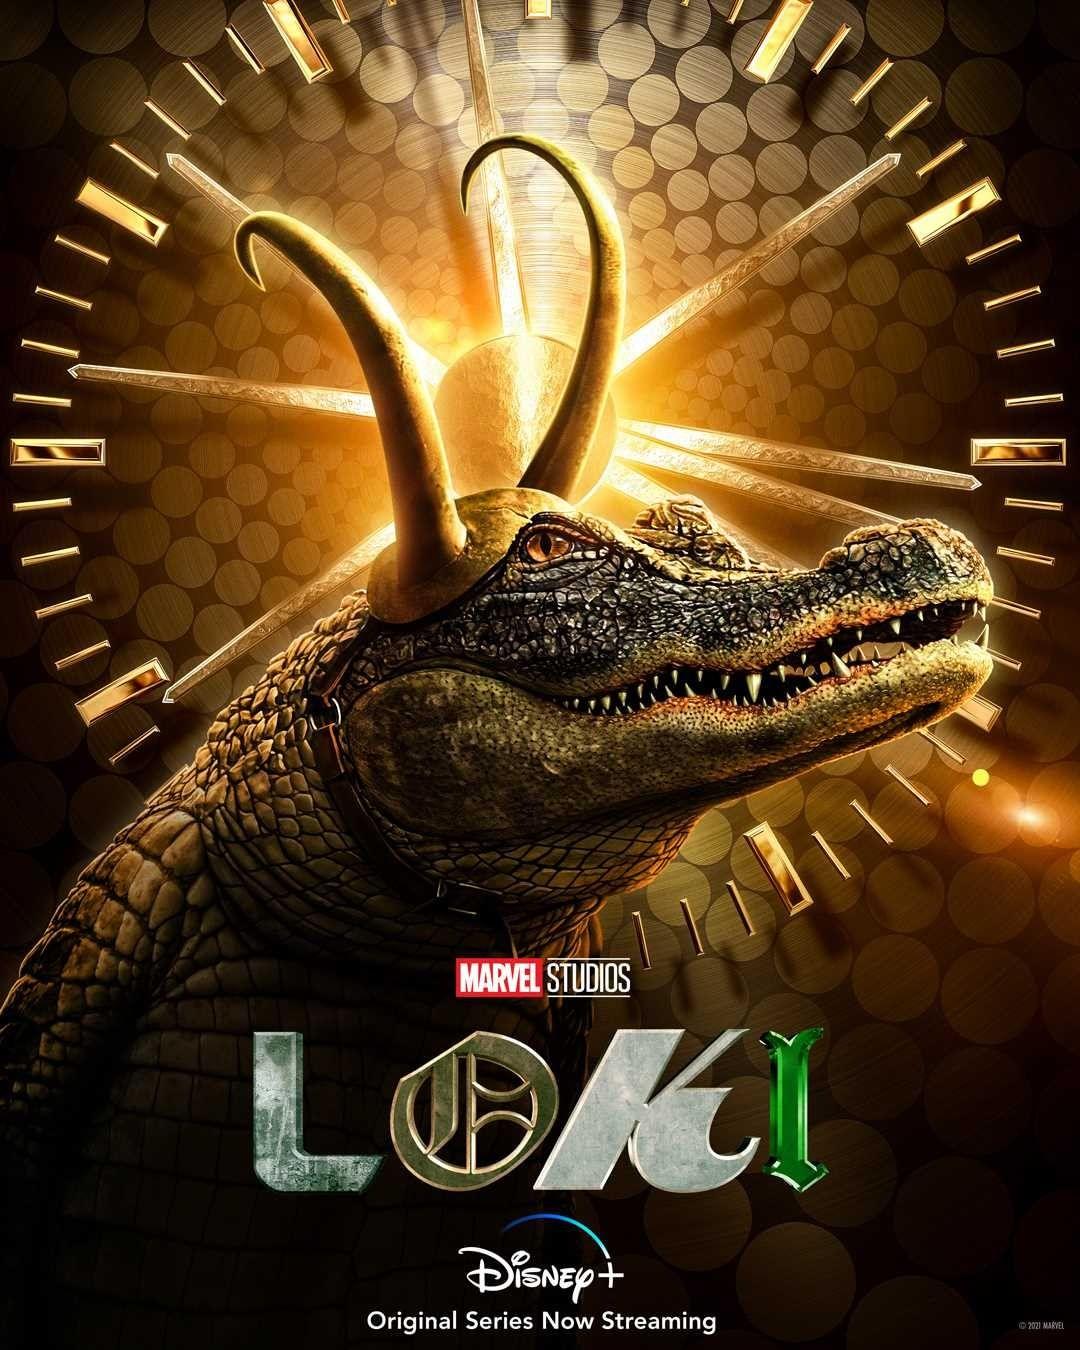 LOKI | Série da Marvel Studios tem pôsteres individuais divulgados das Variantes Loki - Alligator Loki